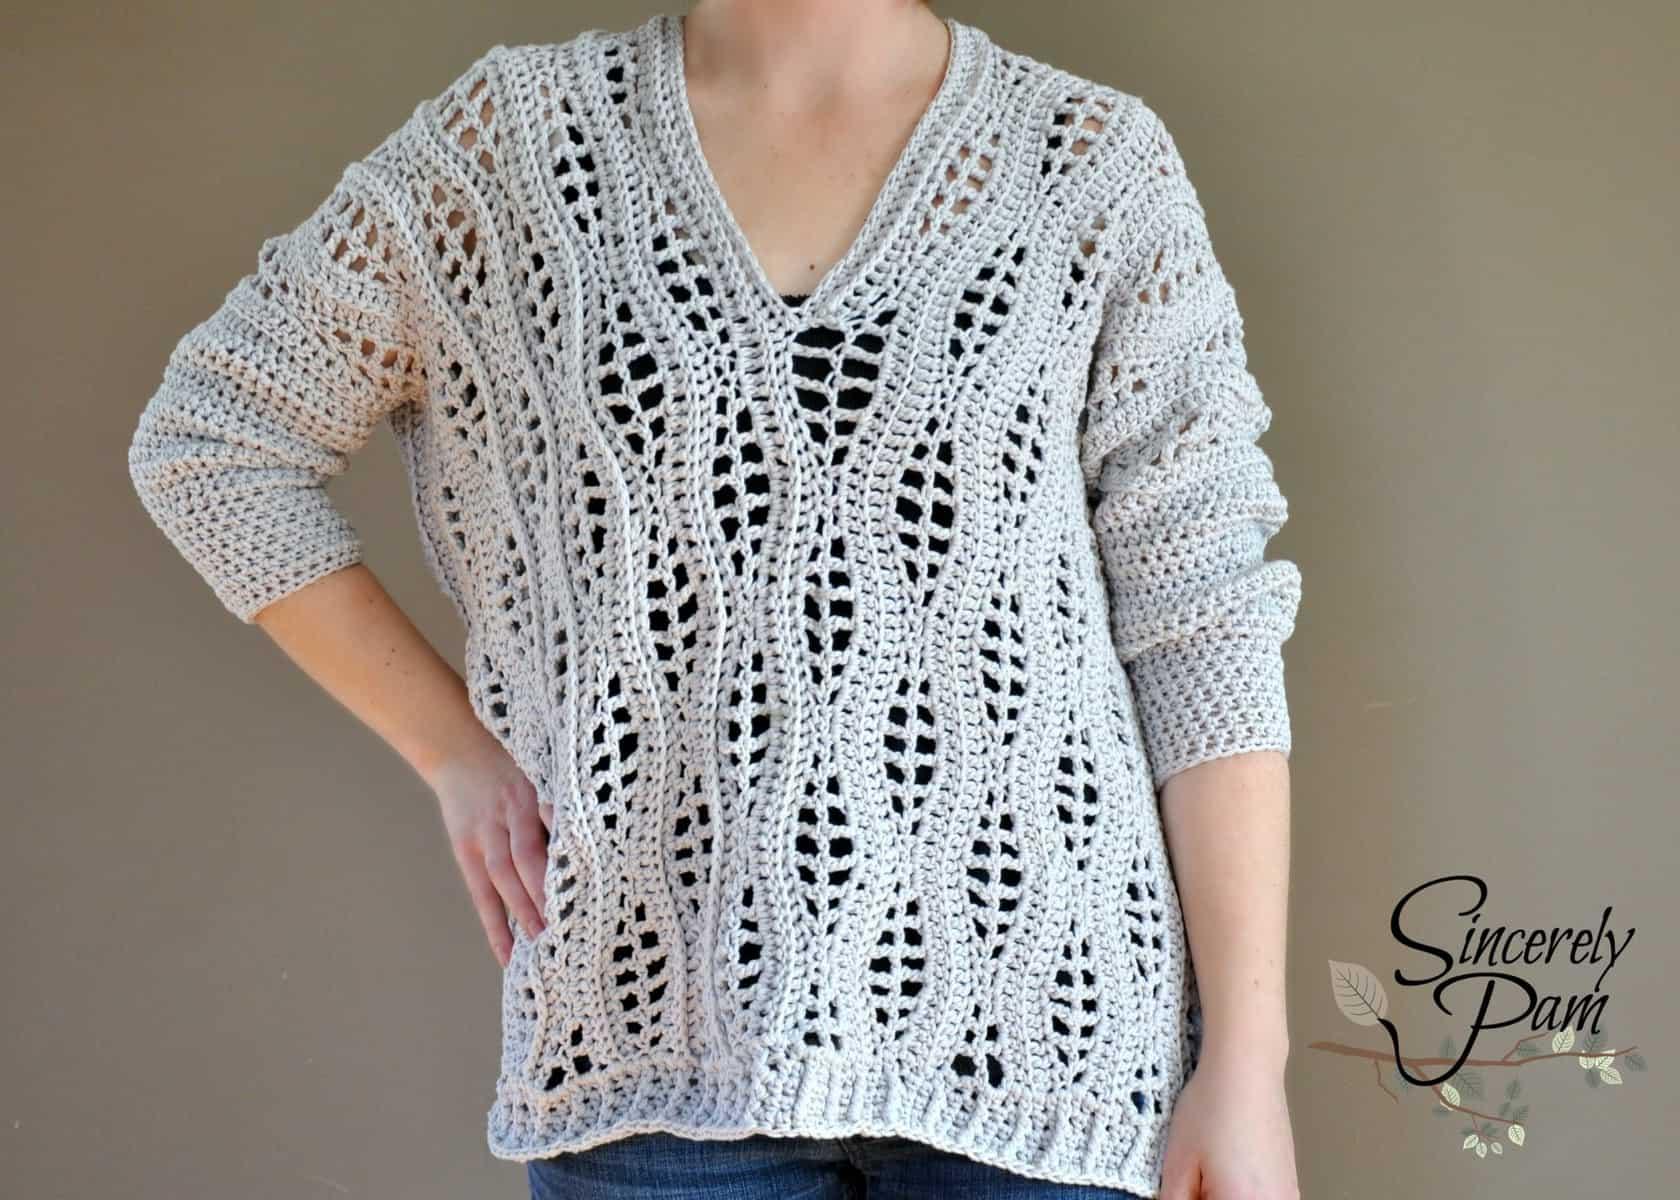 The Salena Sweater | Pam Dajczak